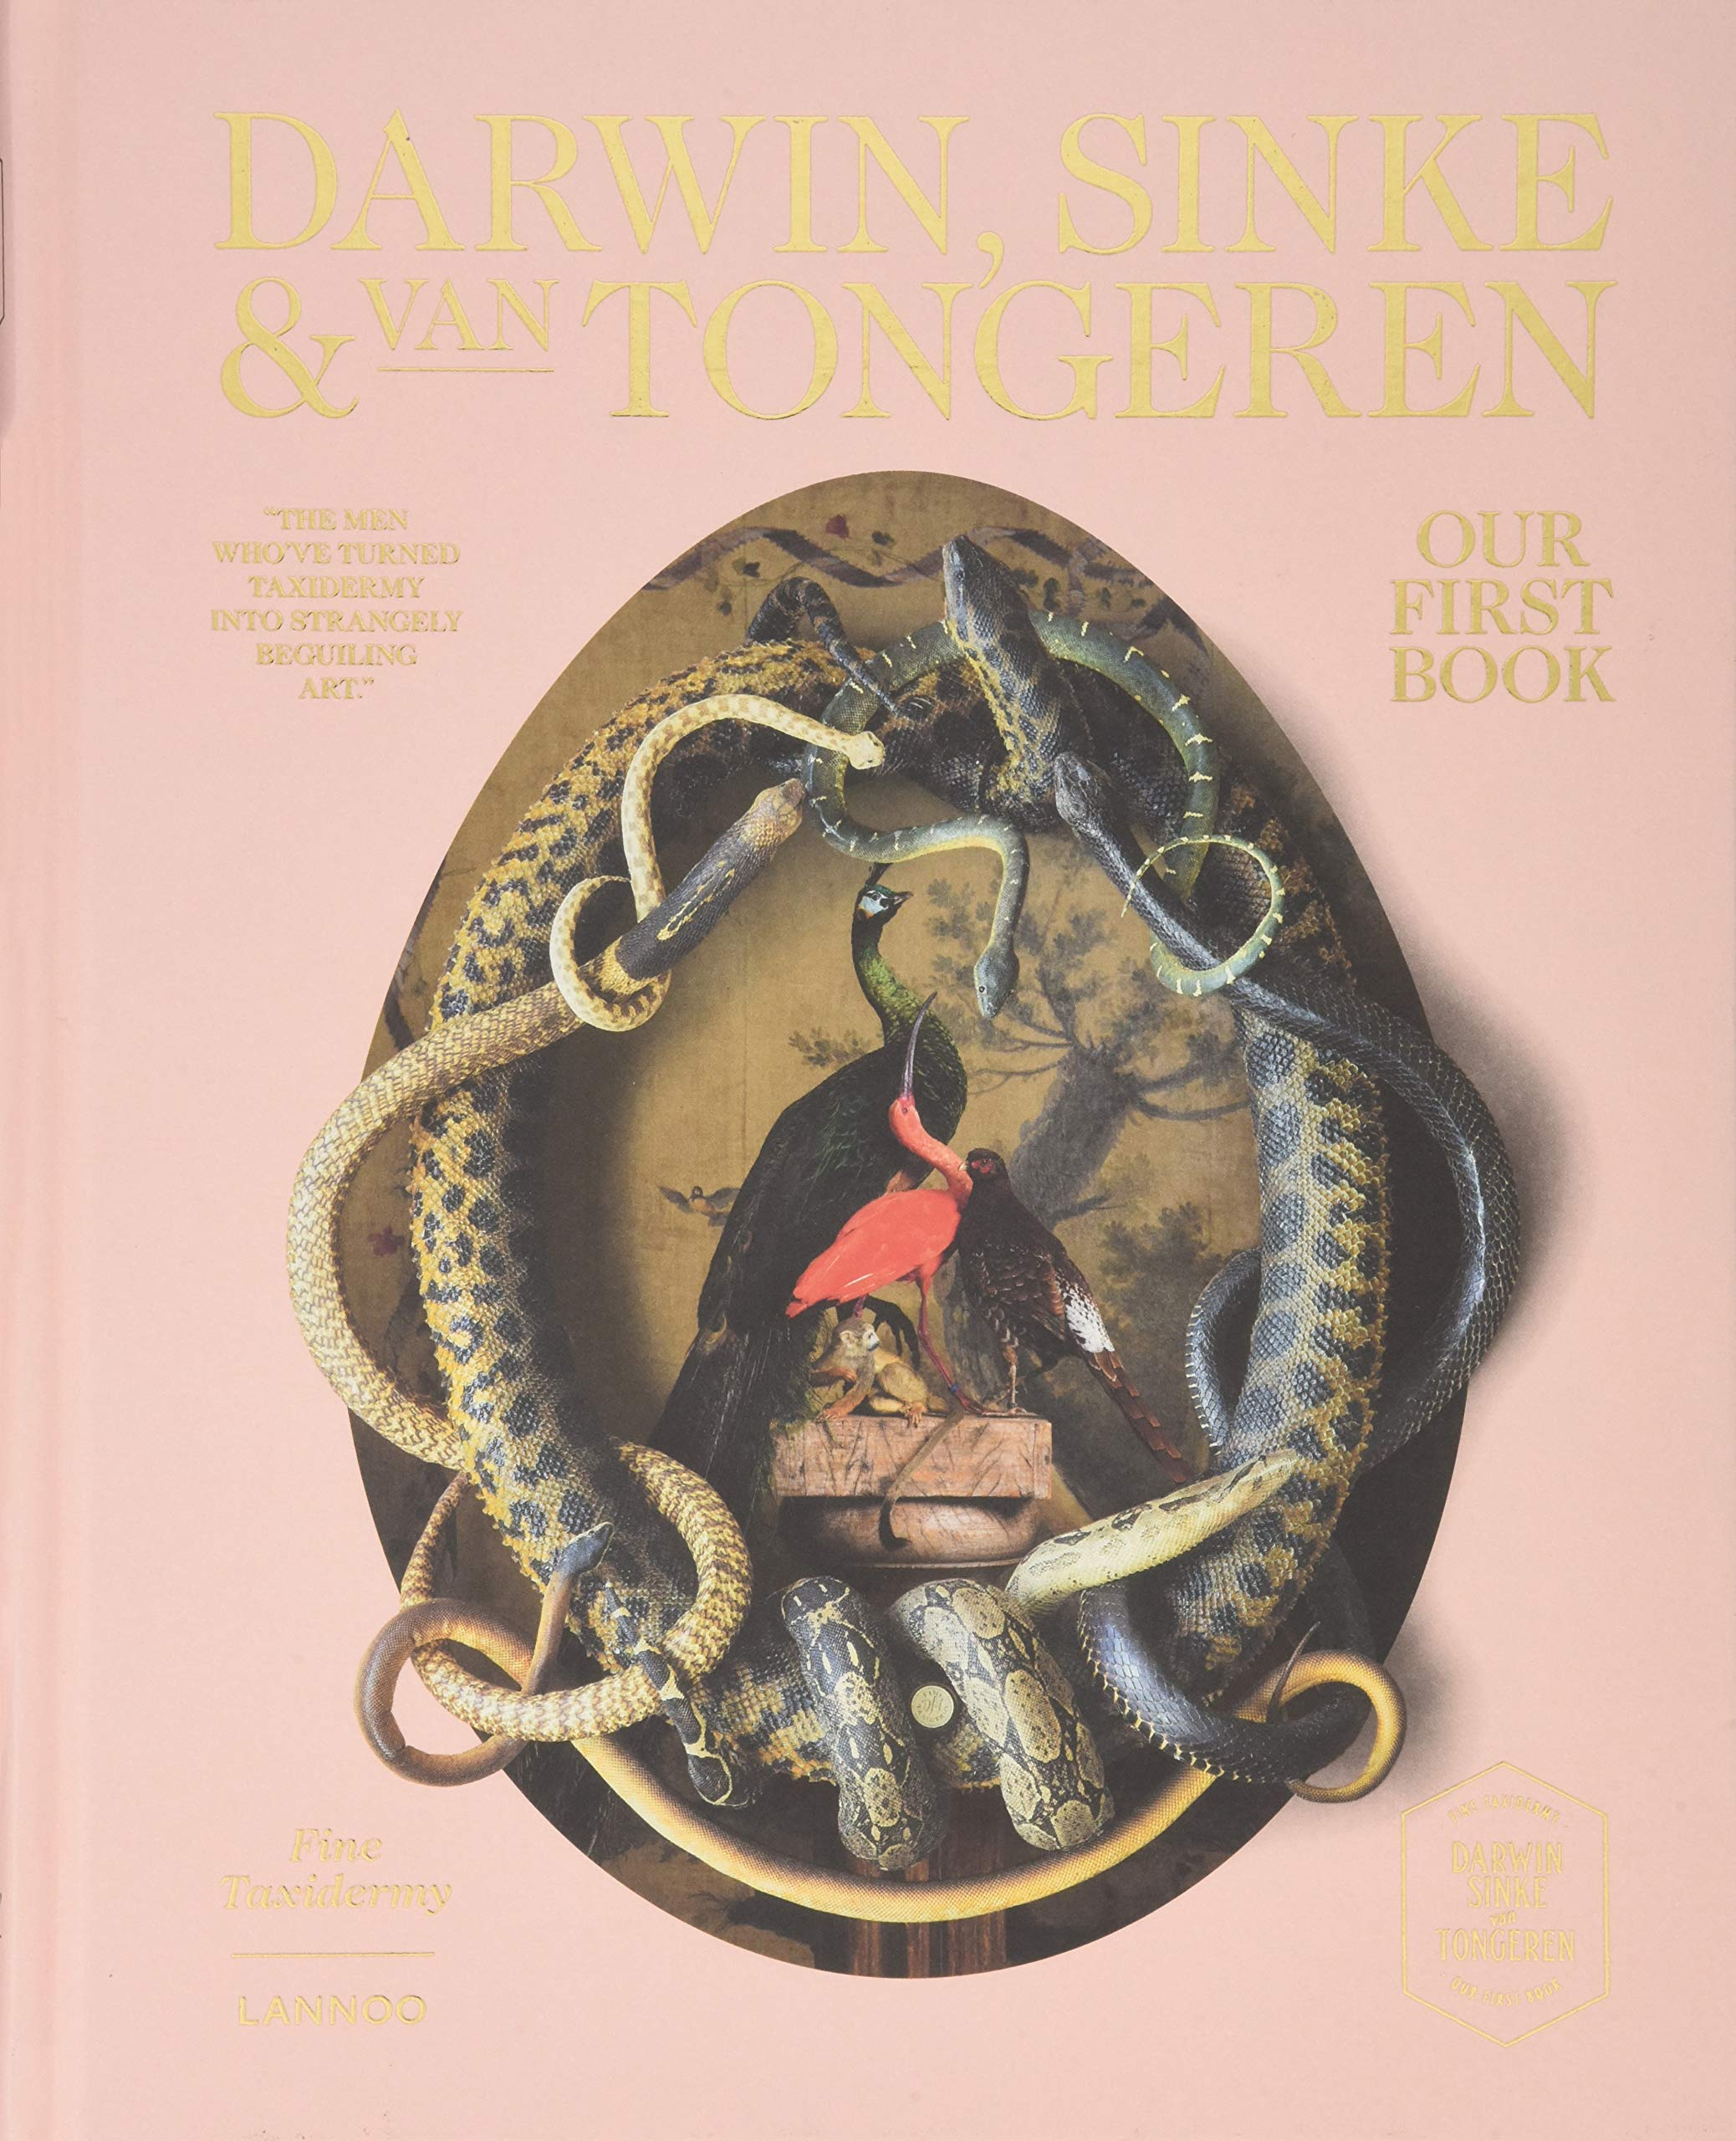 Our First Book - Fine Taxidermy: By Darwin, Sinke & van Tongeren by Lannoo Publishers